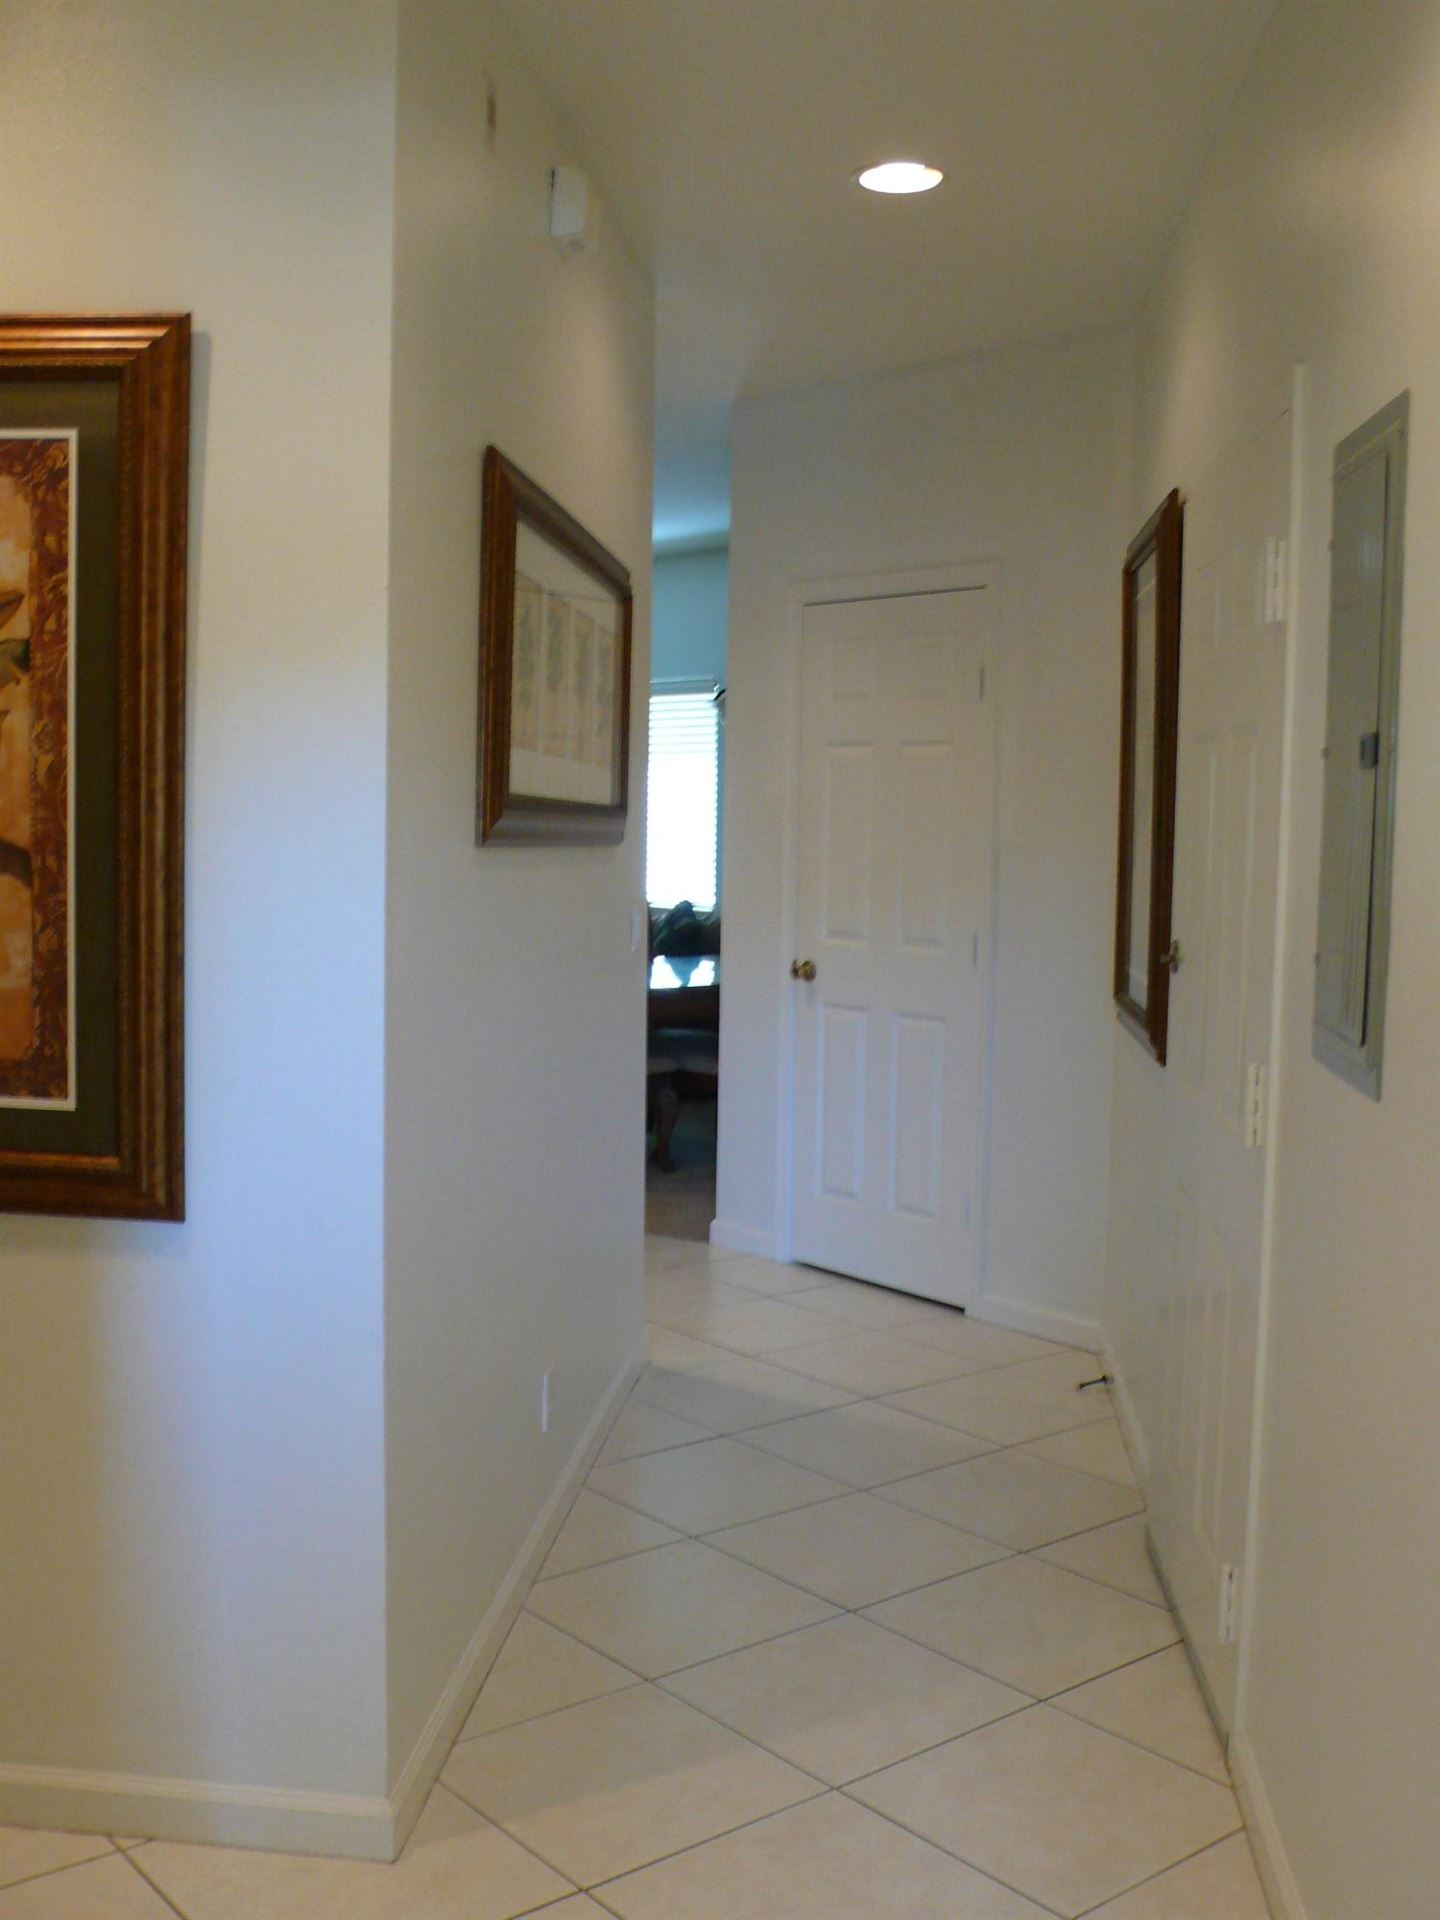 Photo of 8319 Mulligan Circle #3112, Port Saint Lucie, FL 34986 (MLS # RX-10635983)